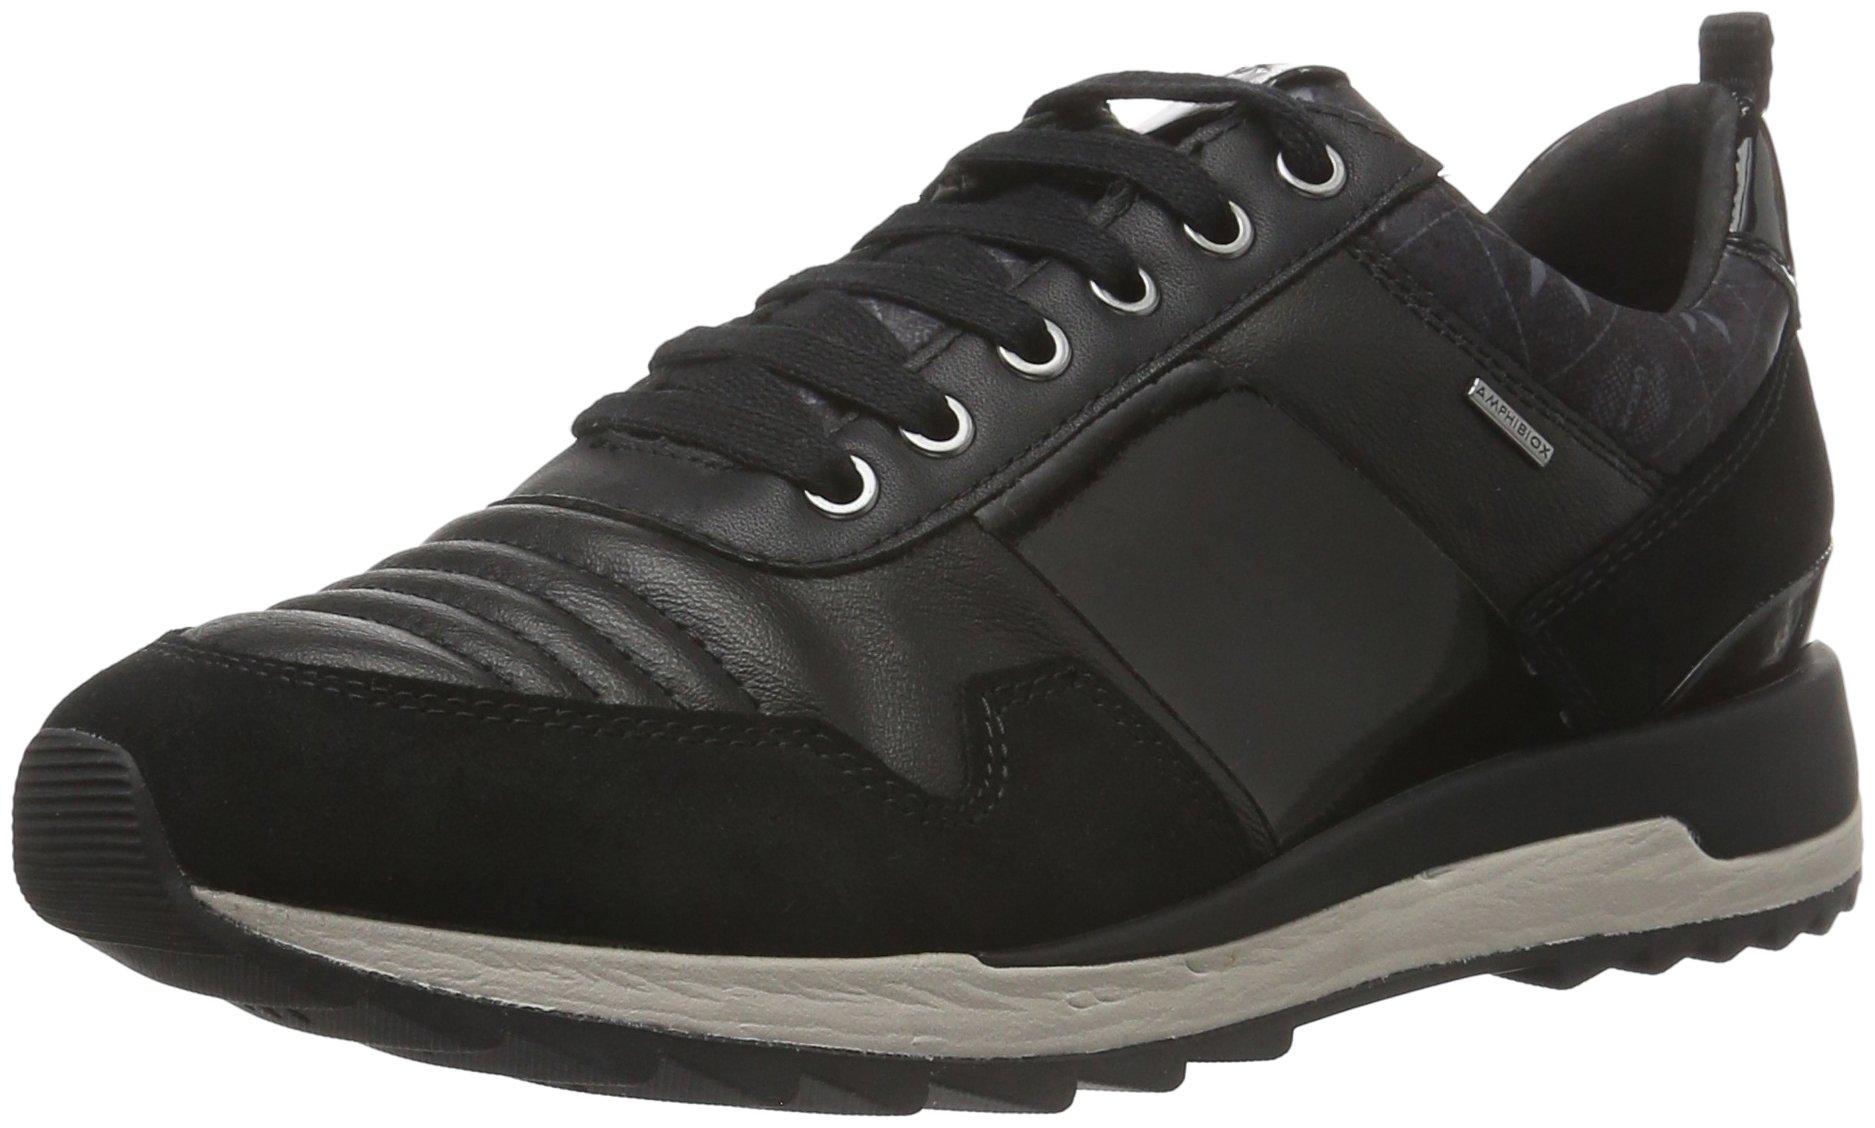 Geox D Aneko B ABX Womens Leather Waterproof Sneakers / Shoes-Black-10.5